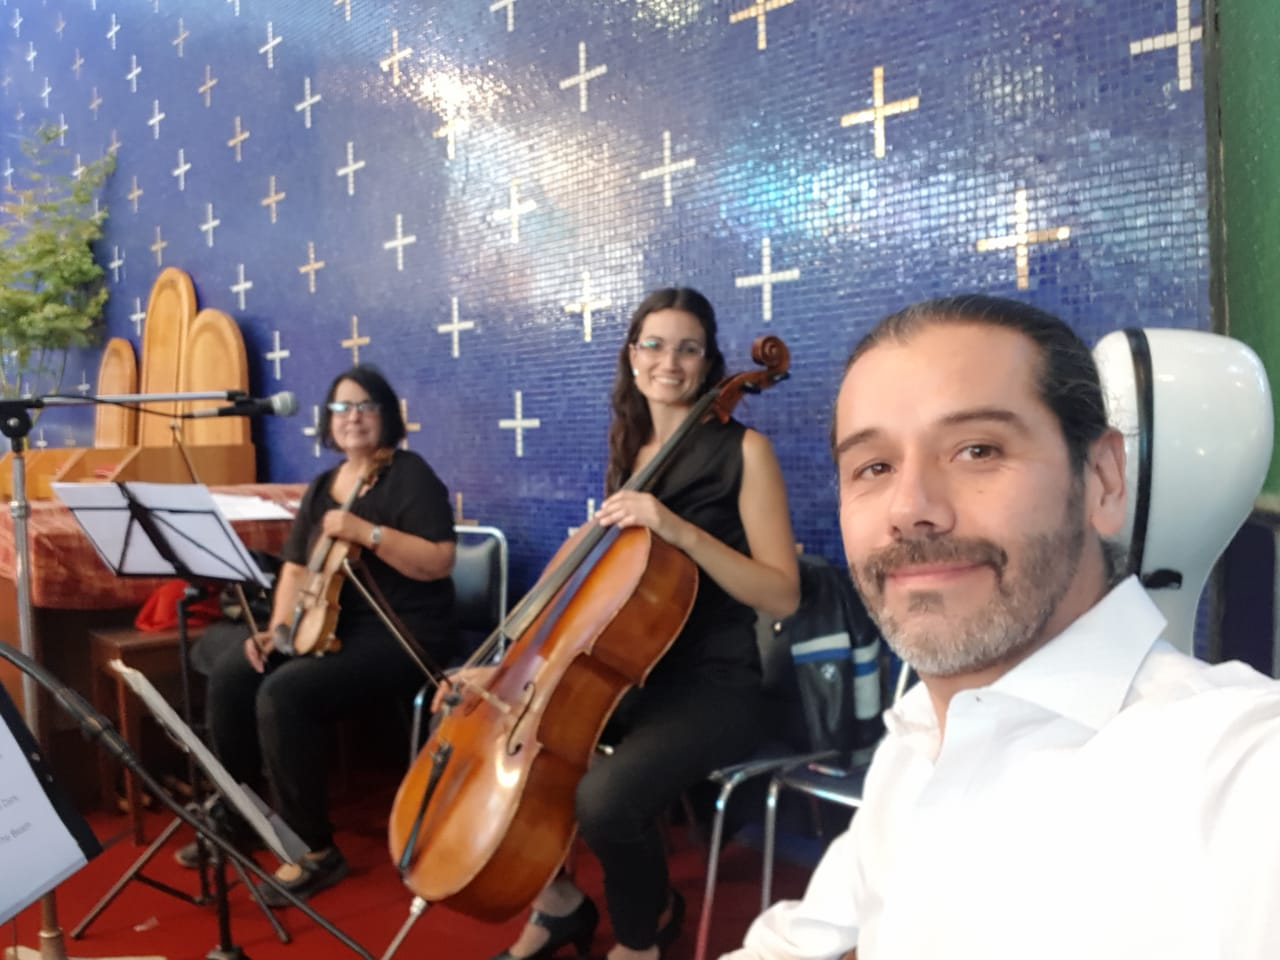 Coro y musicos para matrimonios Agez Chile